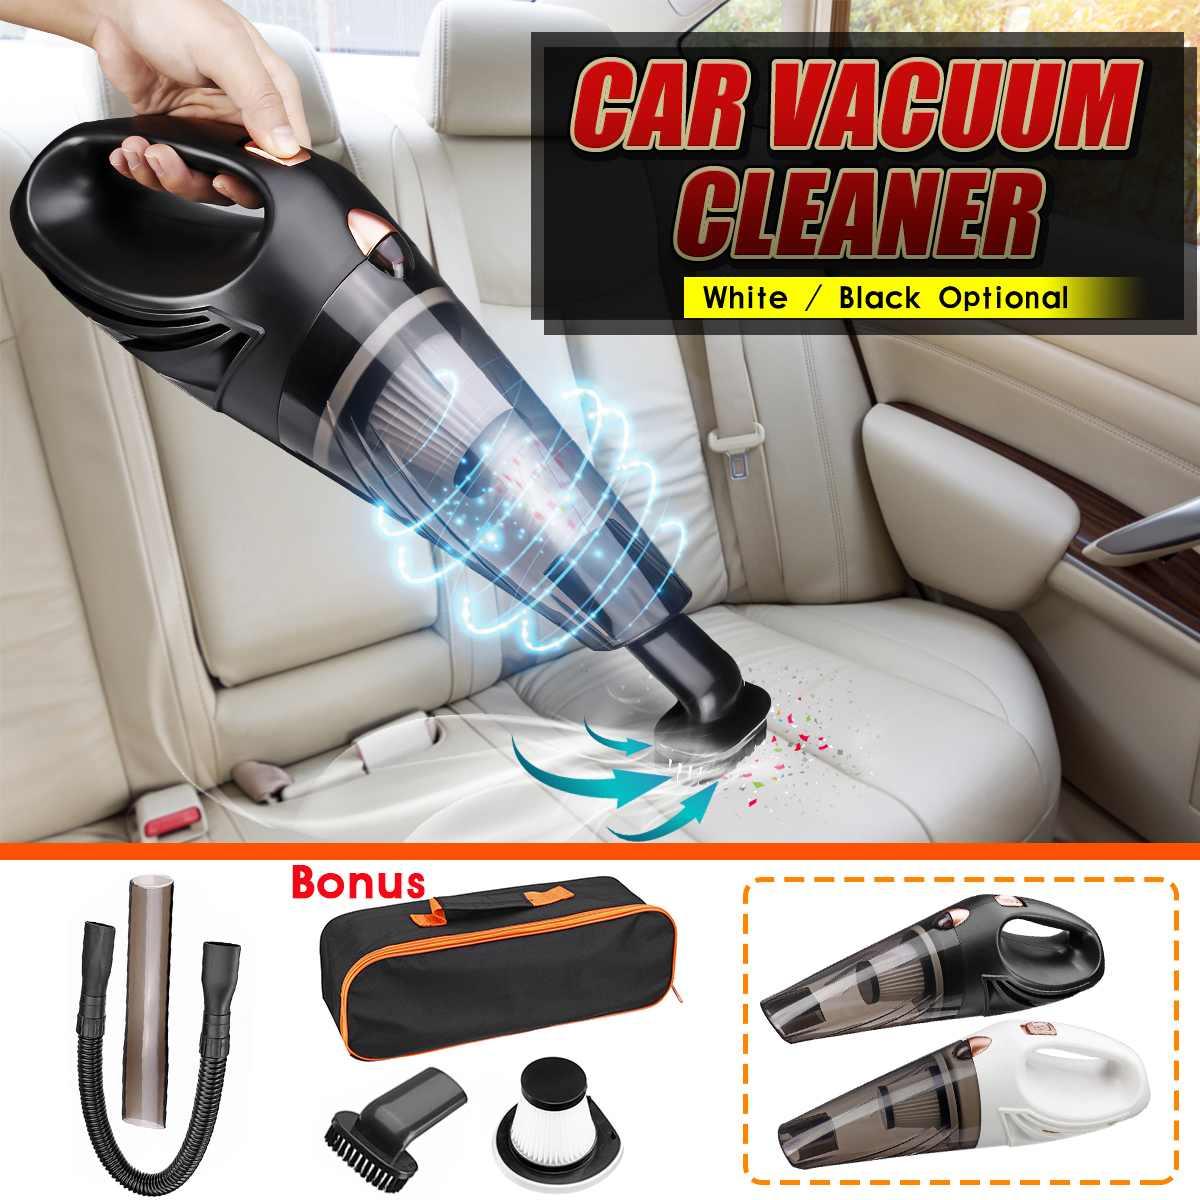 12V Car Vacuum Cleaner Automobile Auto Handheld Vacuum Cleaner Dry / Wet Portable Duster Indoor Home Car interior Powerful